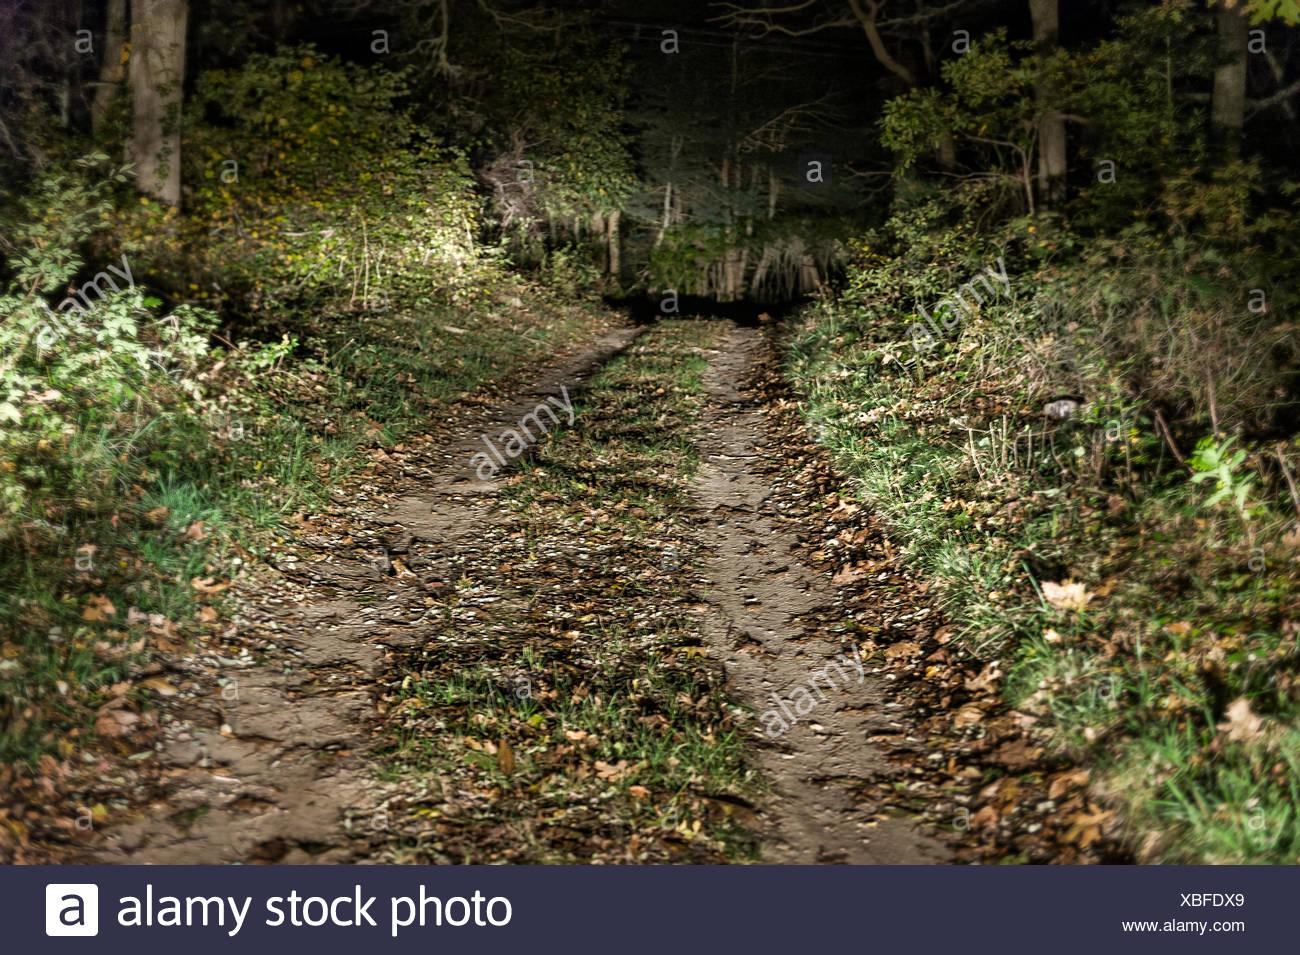 Foreboding dirt road at night. - Stock Image